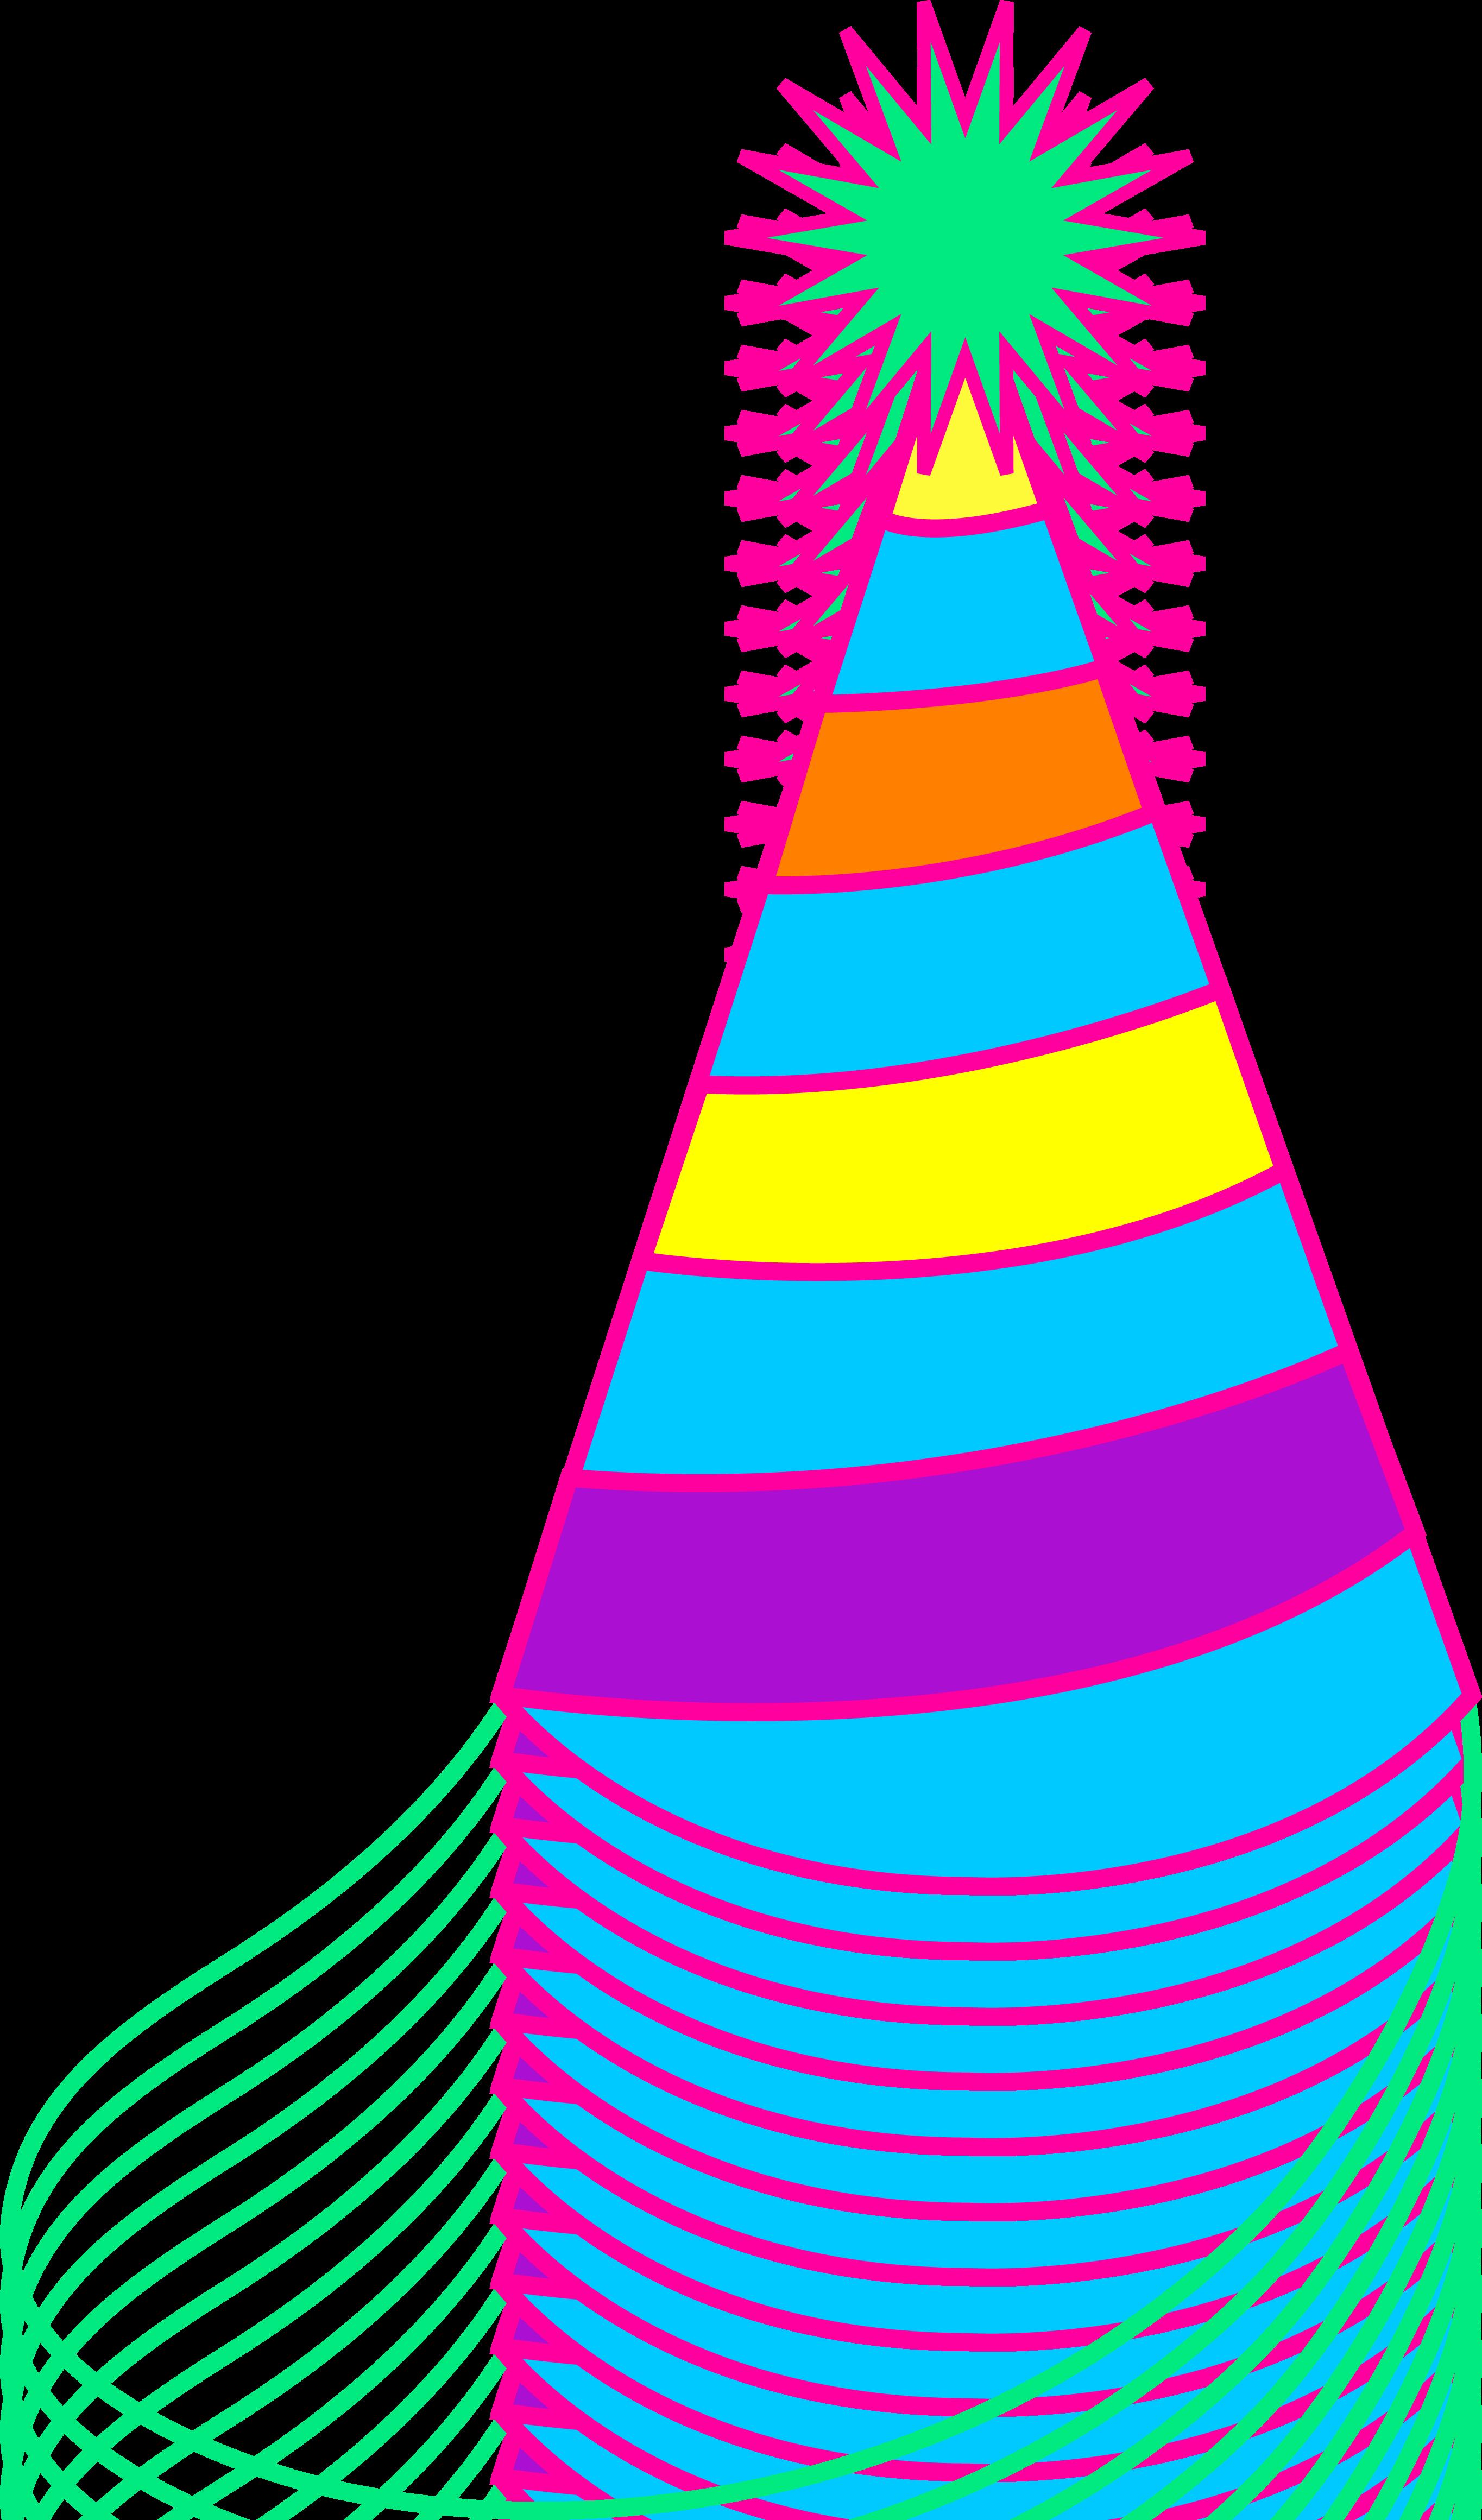 2729x4641 Birthday Hat Clip Art Tumundografico 4